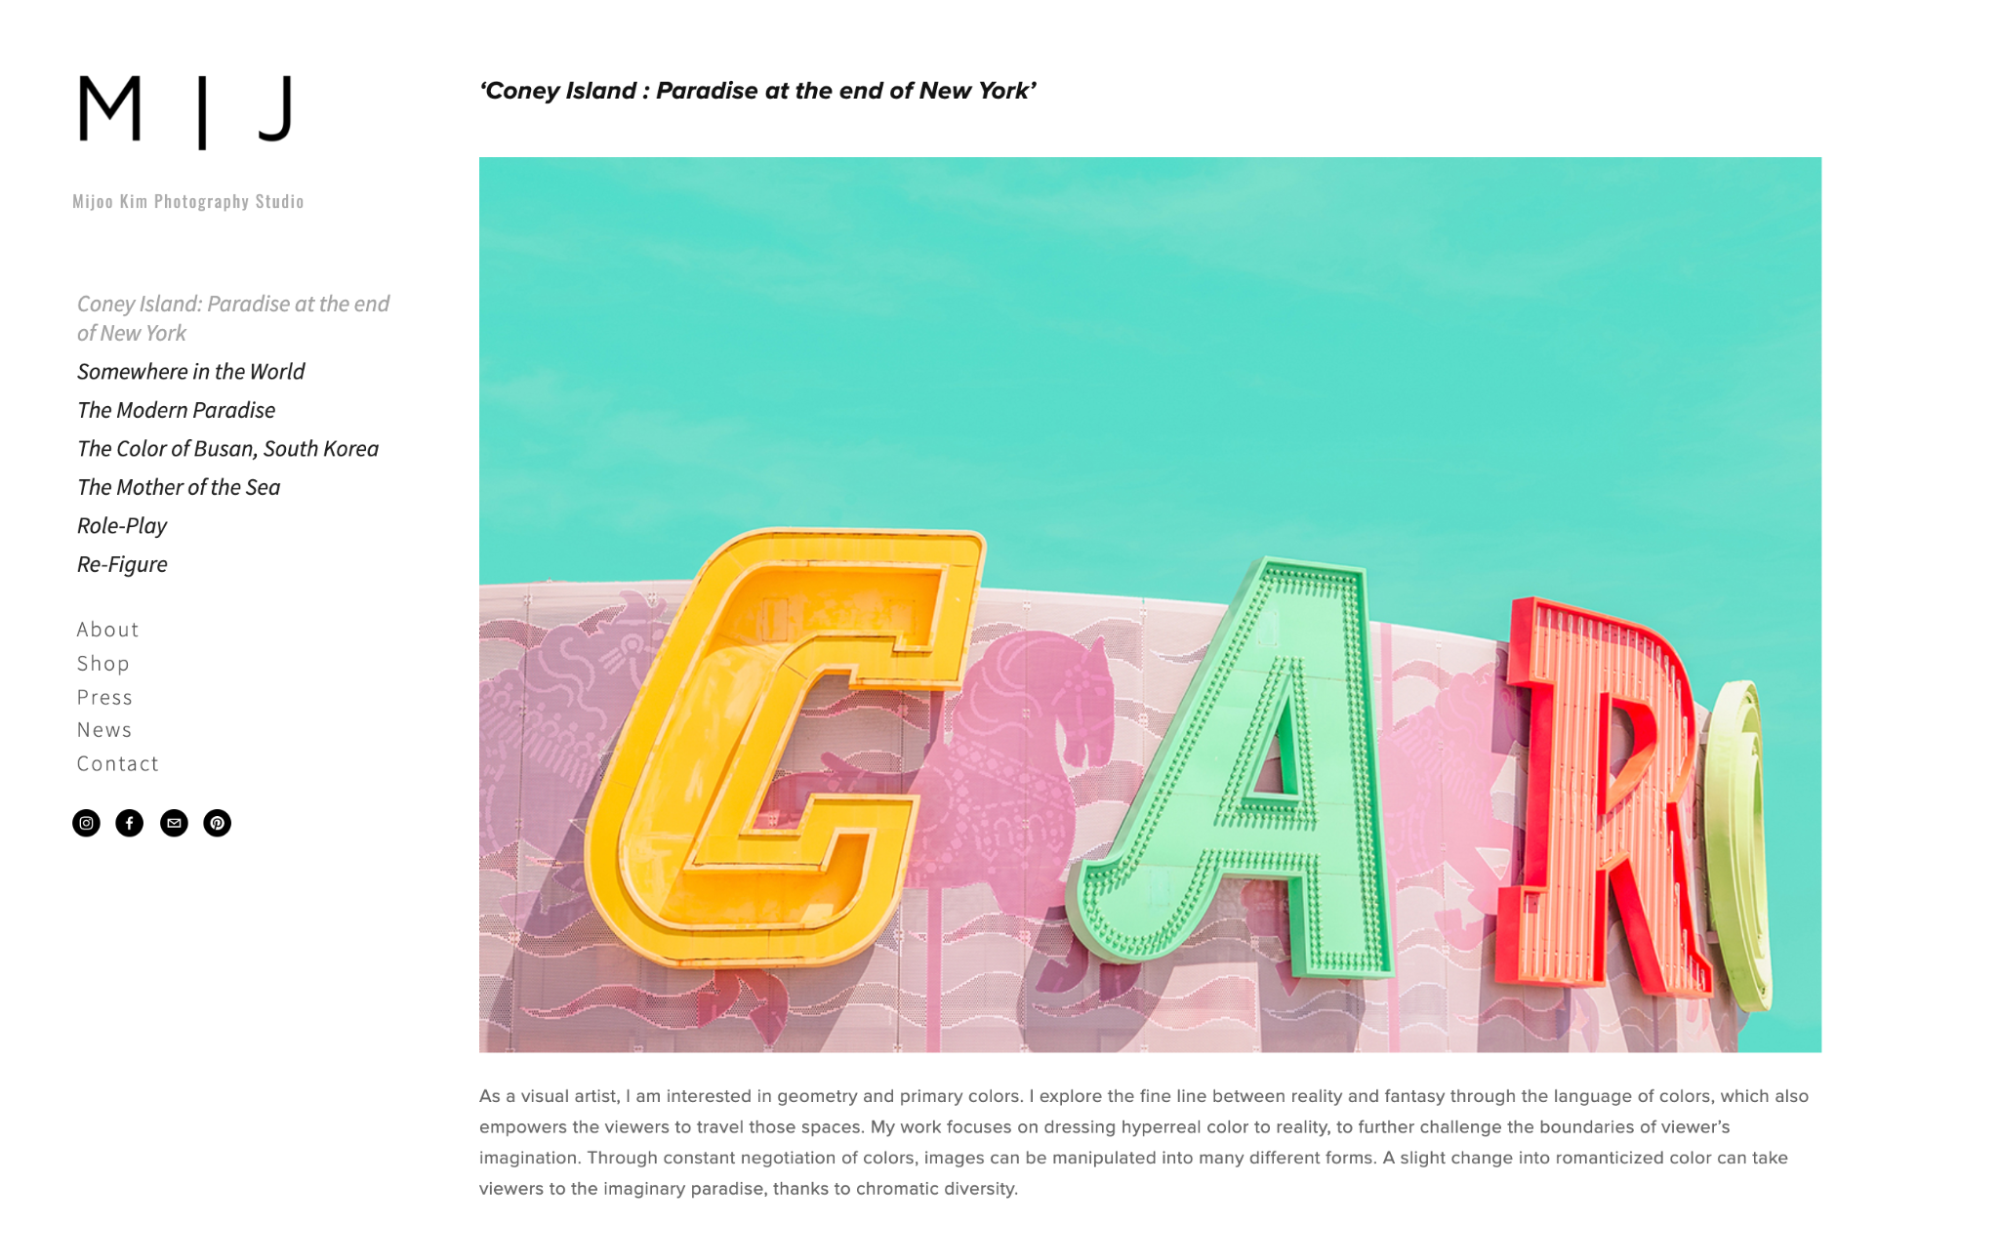 Example of a photography portfolio online.